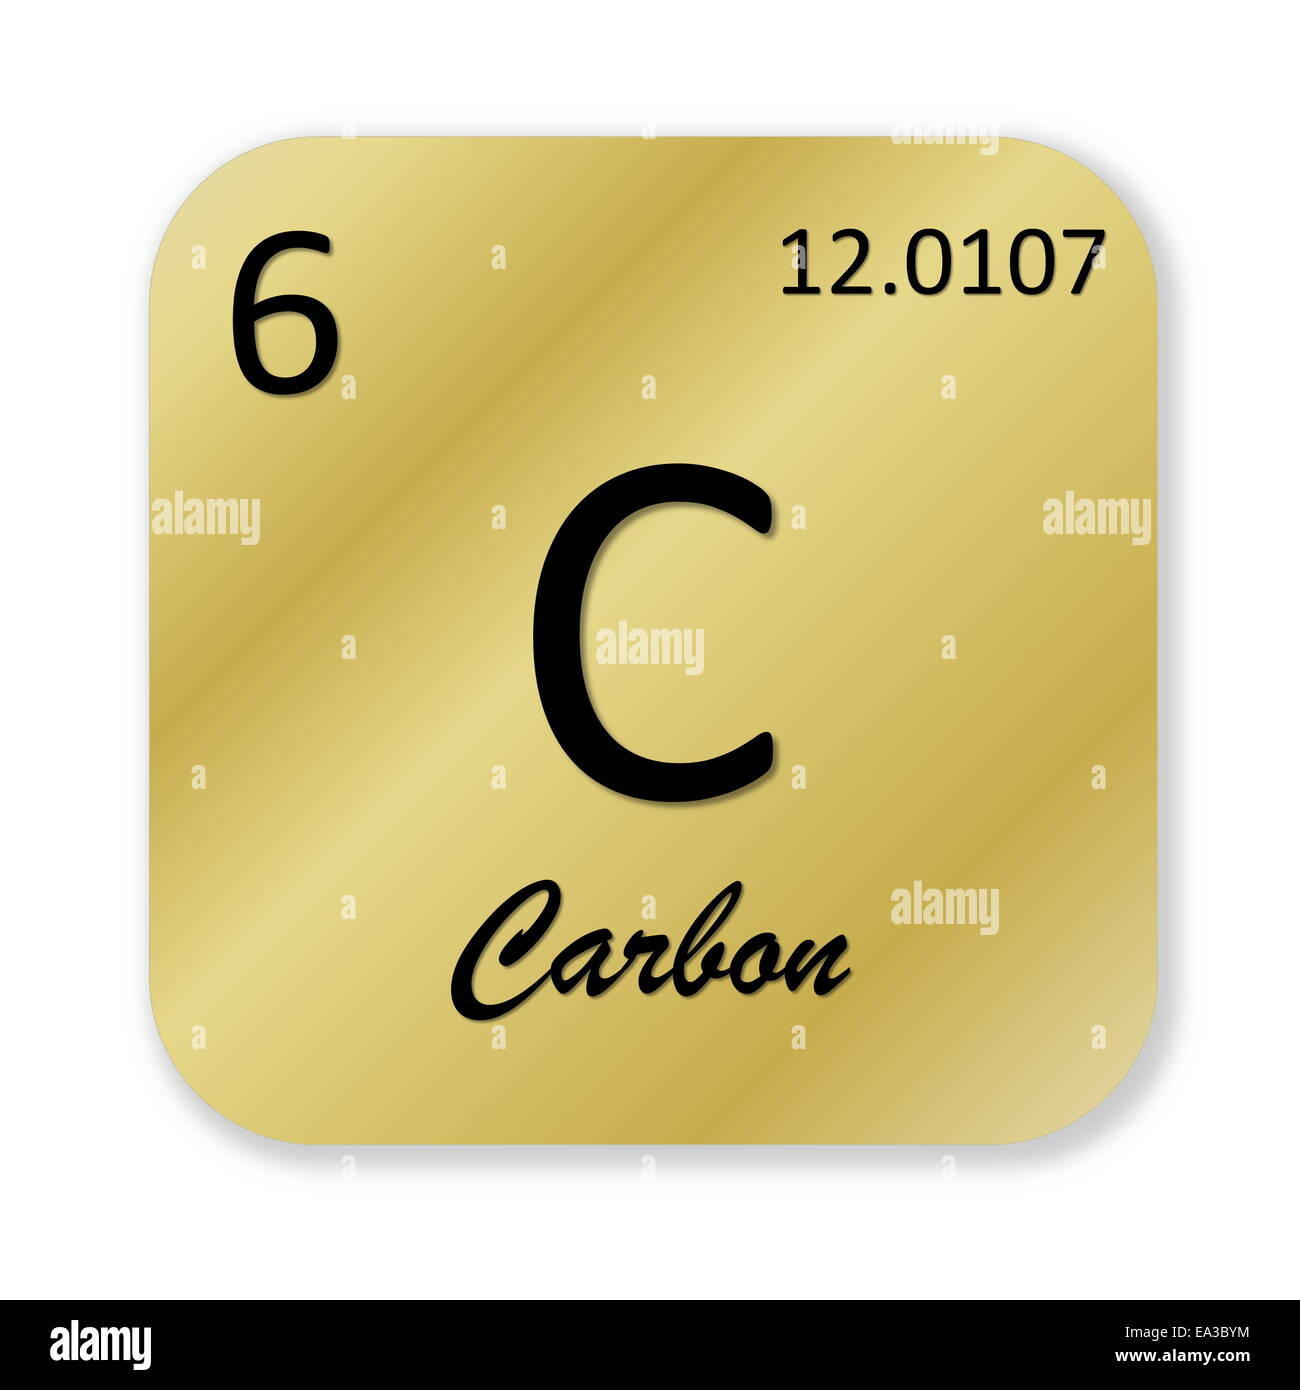 Carbon element stock photo royalty free image 75063288 alamy carbon element buycottarizona